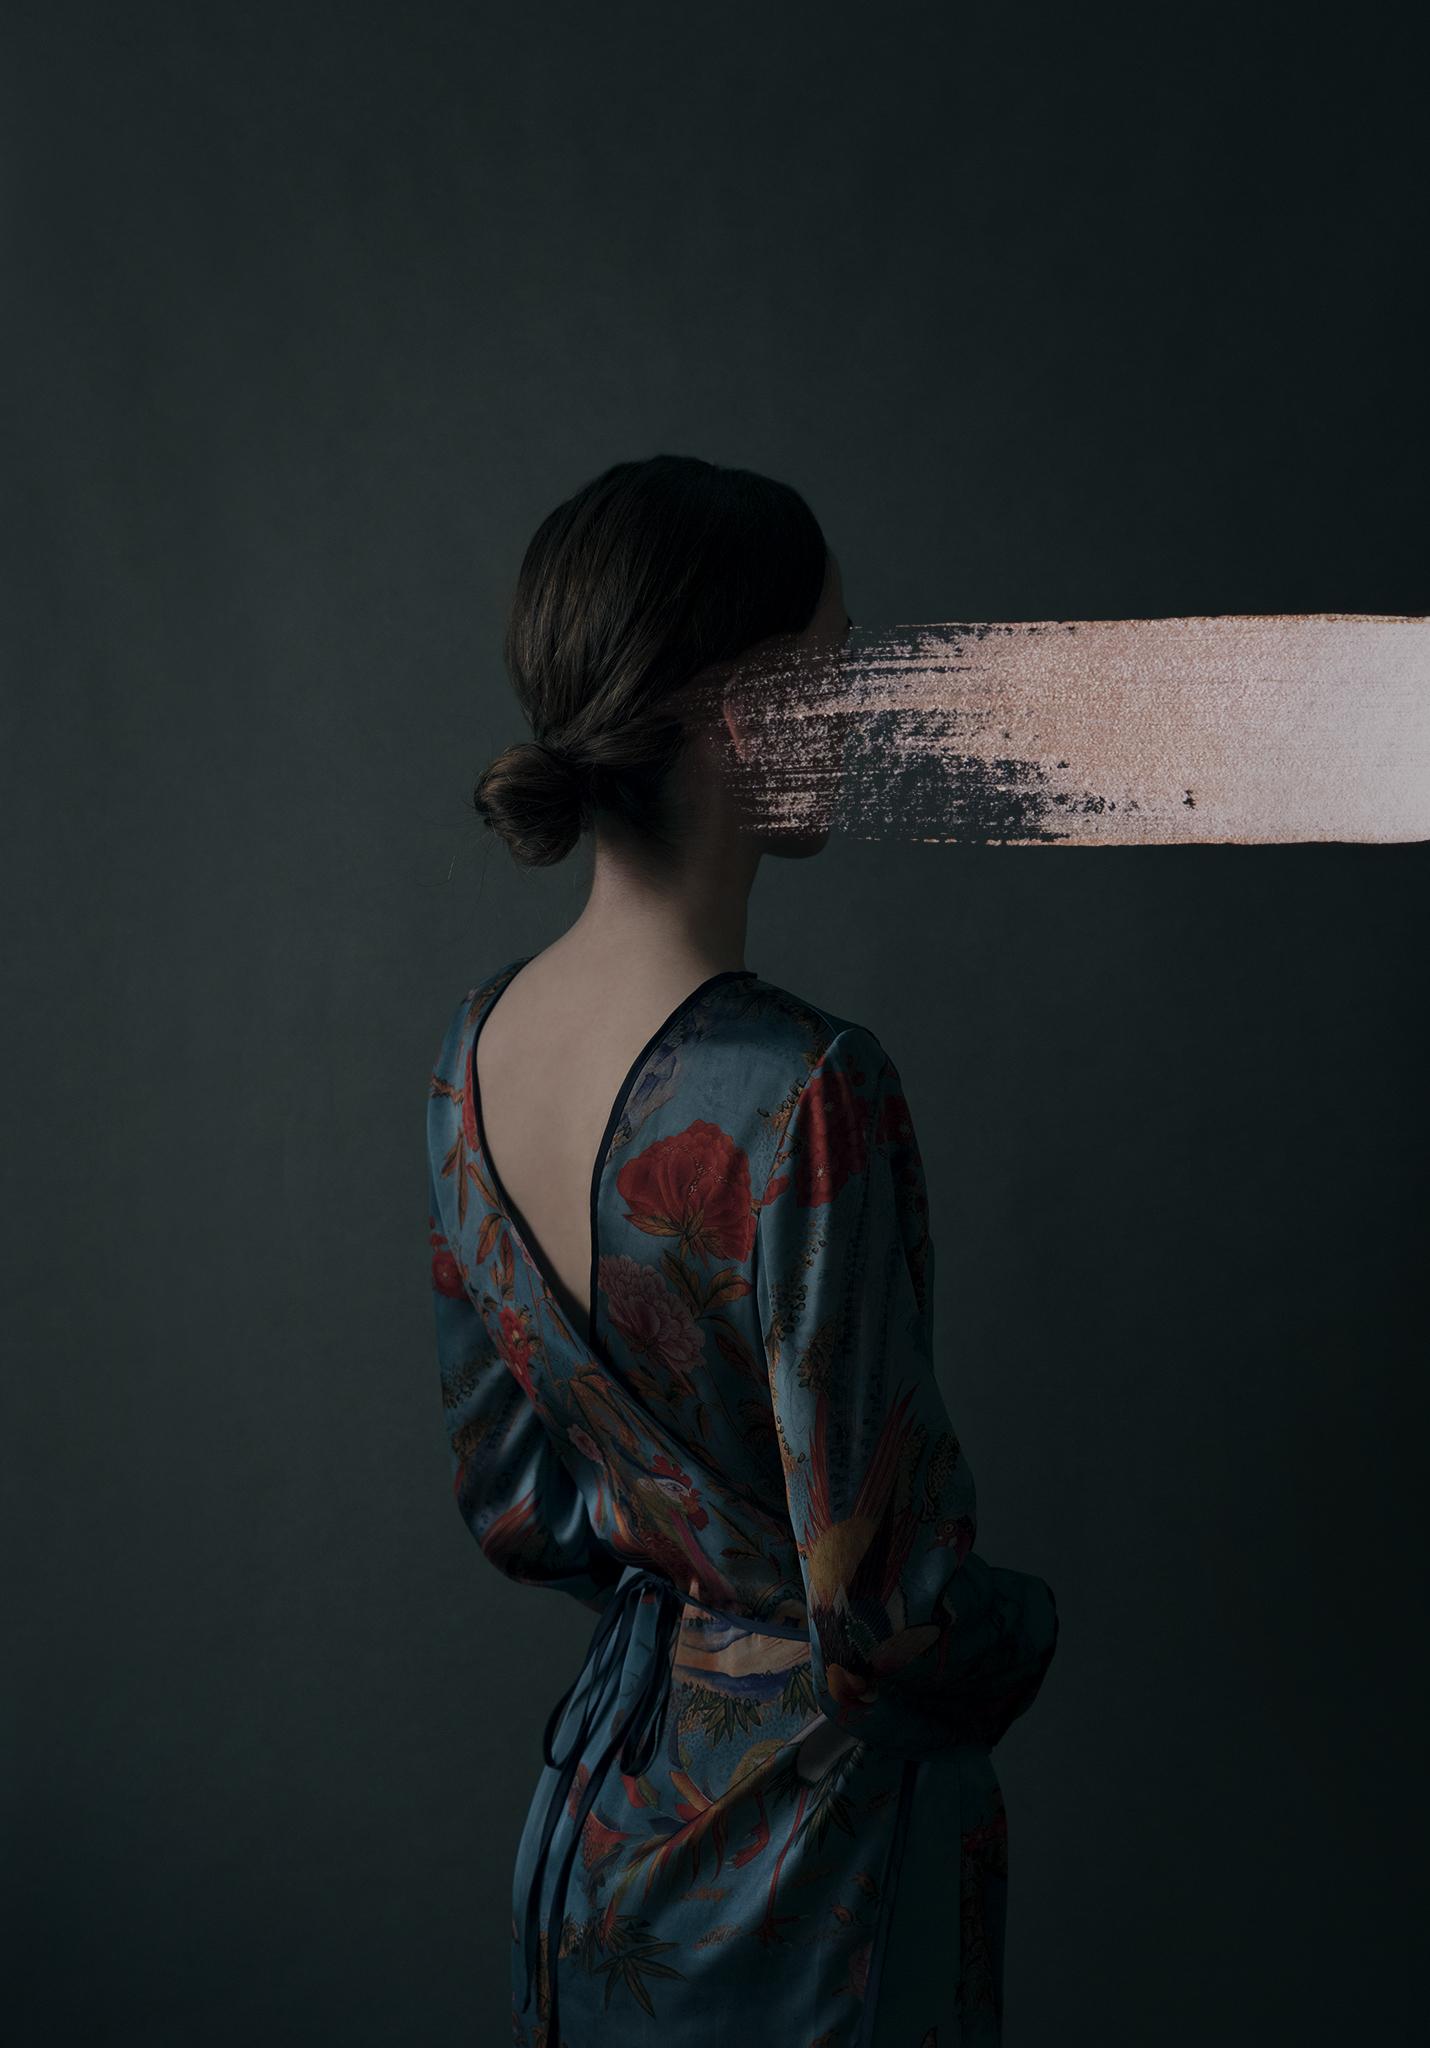 Andrea Torres - selfbrushpeony - Leonhard's Gallery